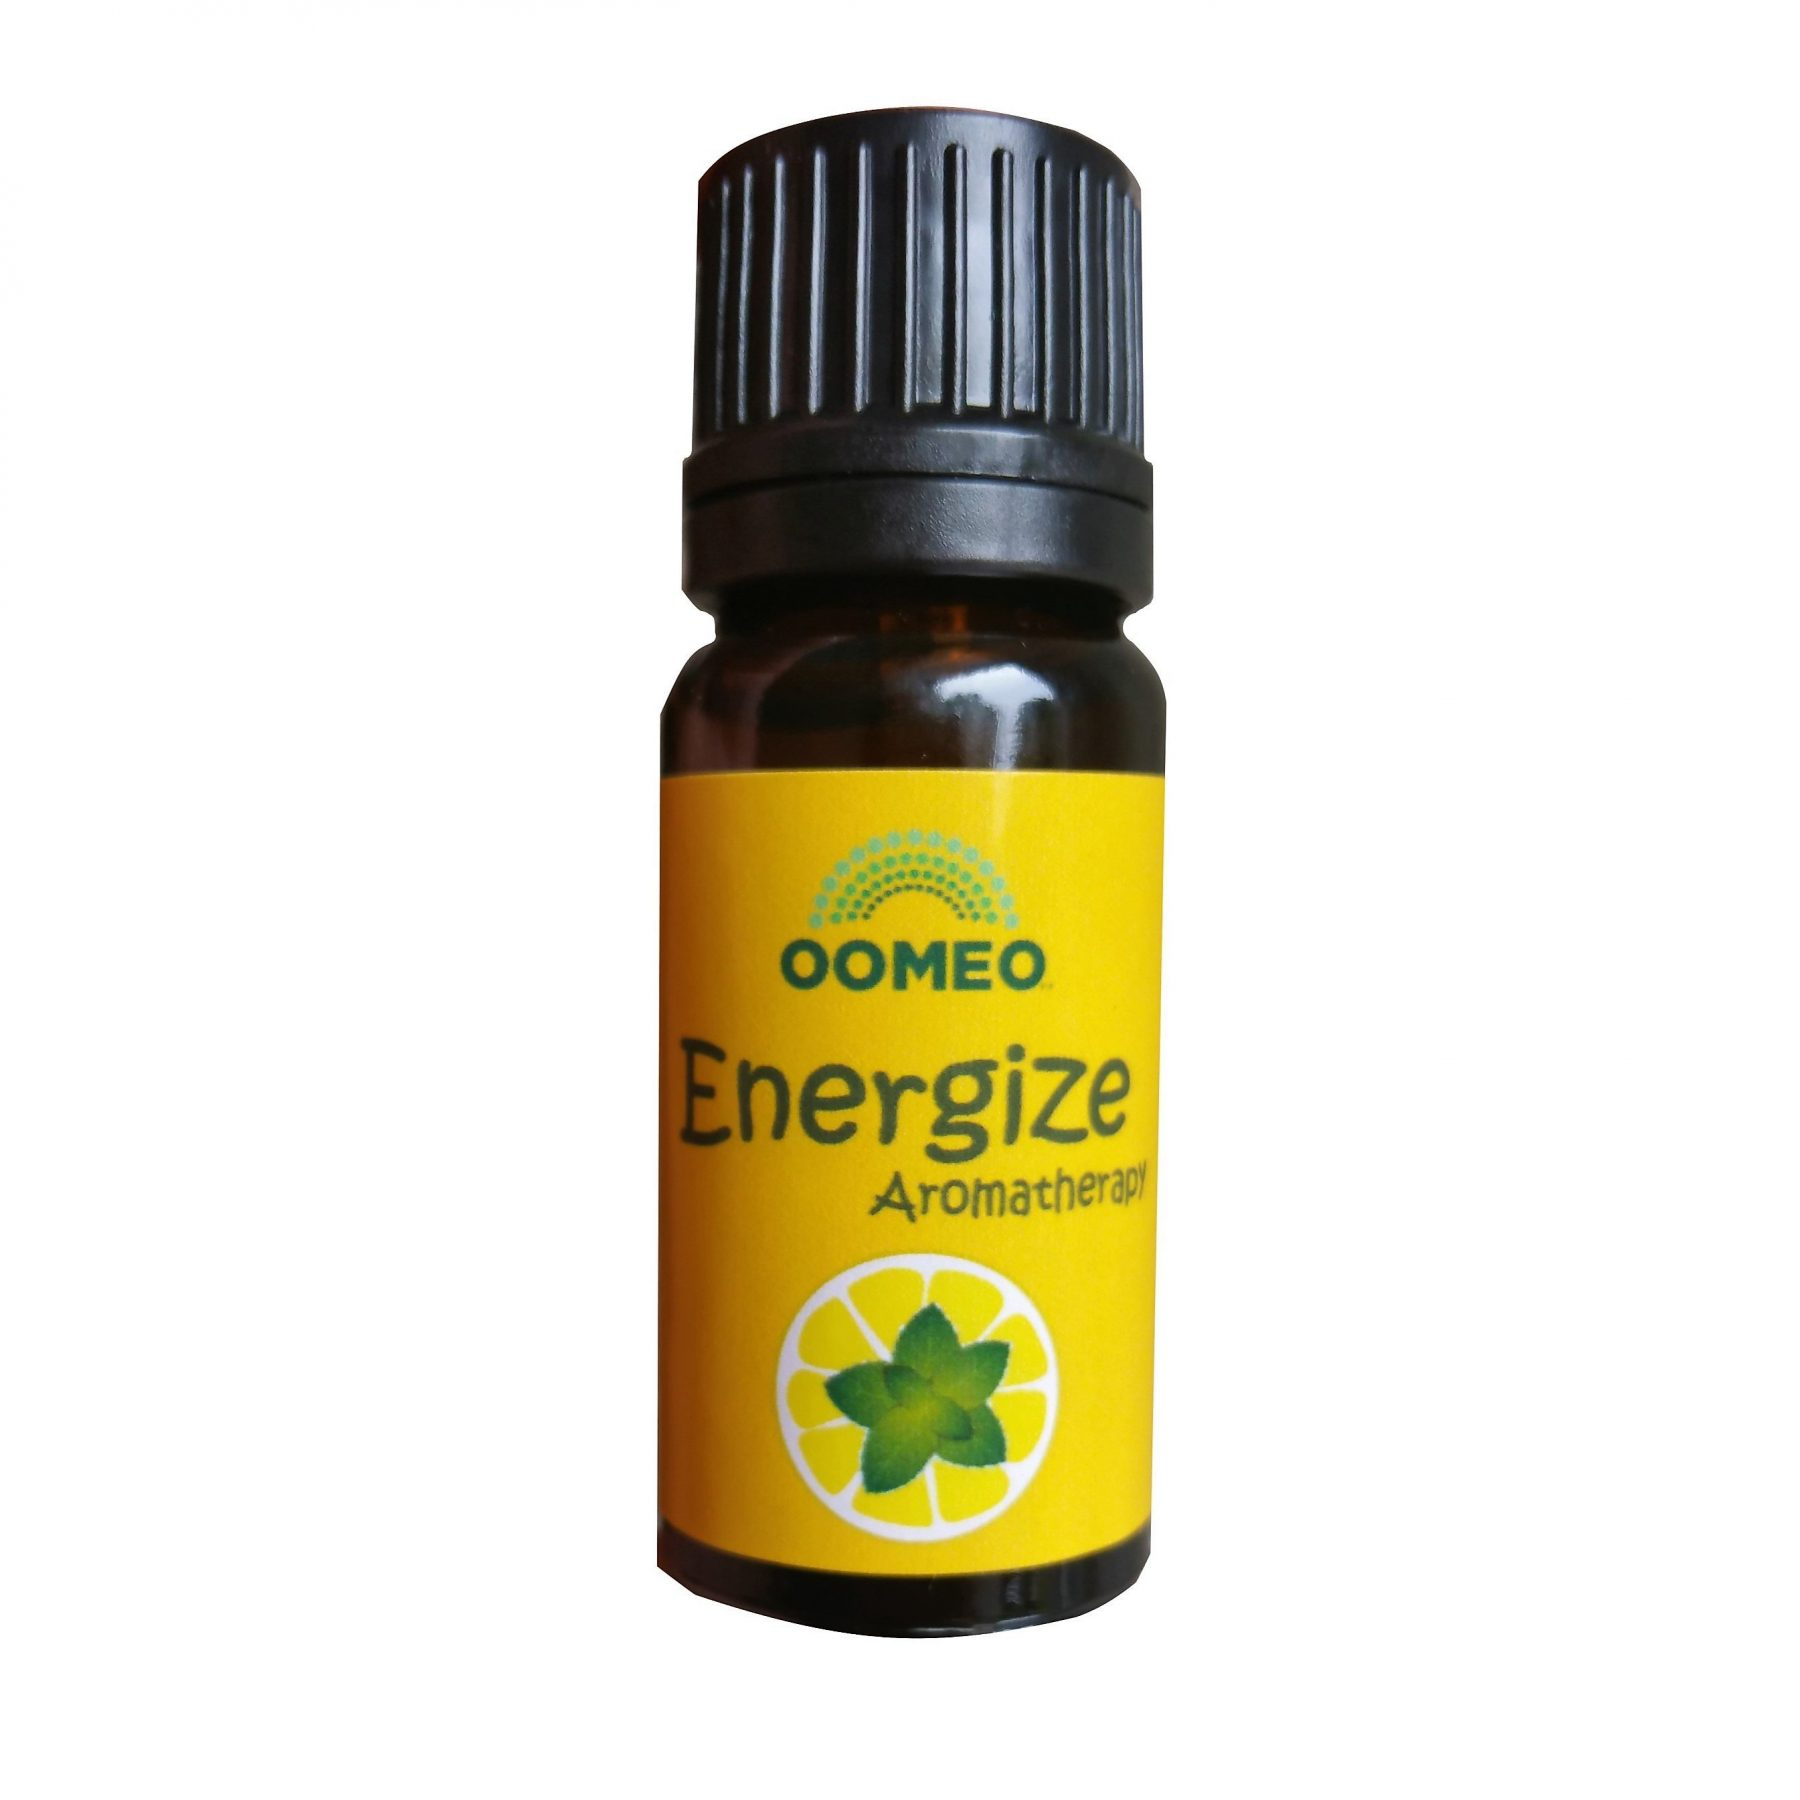 Energize blend of essential oils